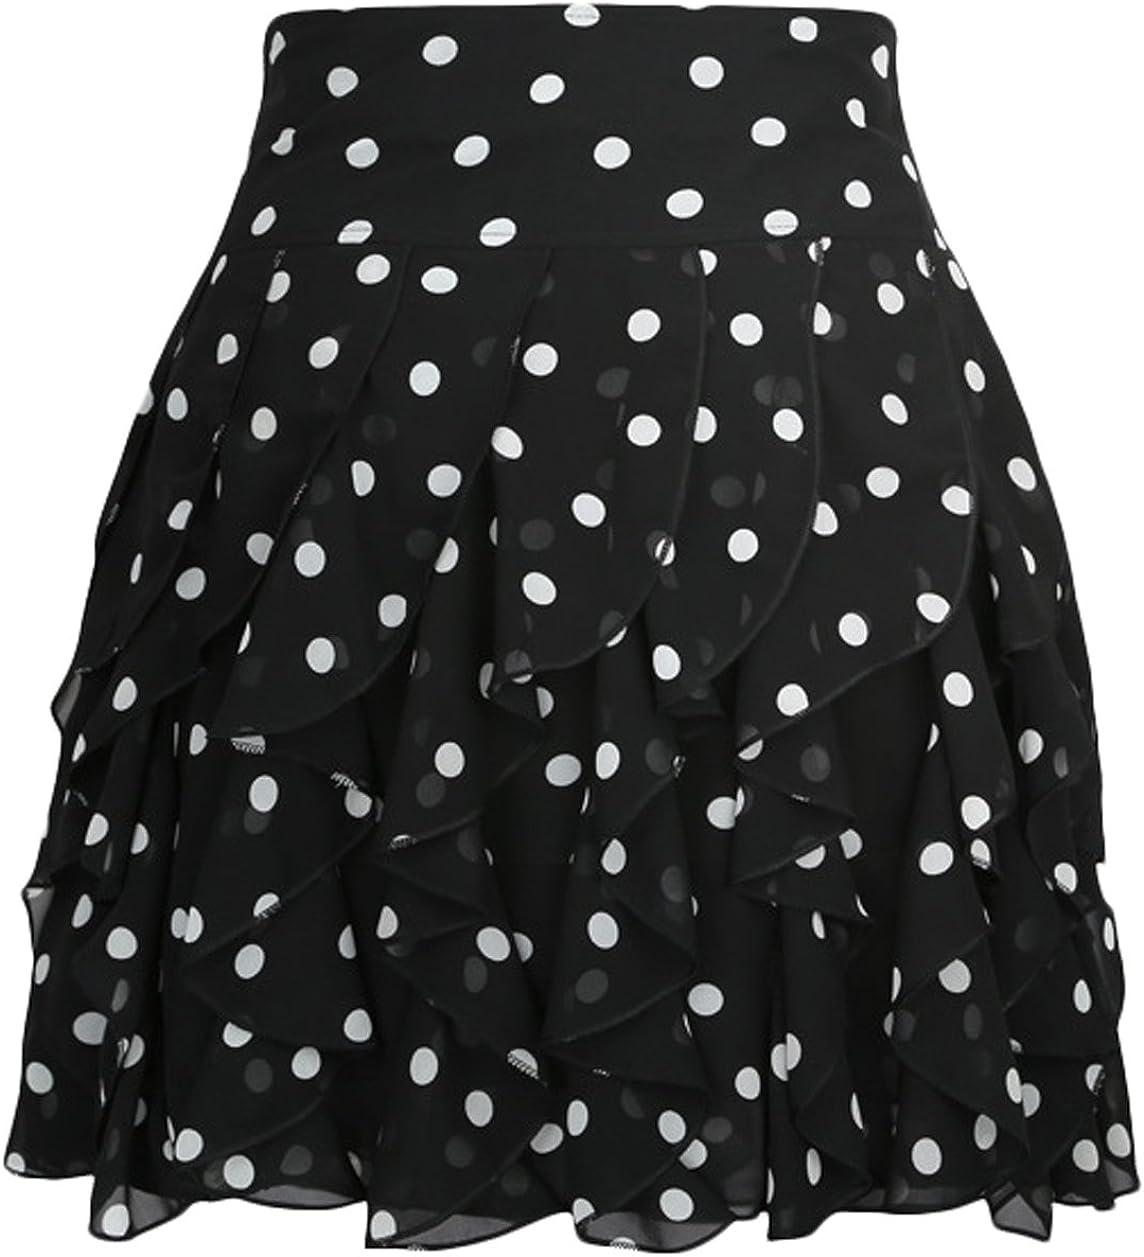 Youhan Women's Casual Layered Chiffon A-Line Pleated Mini Skirt